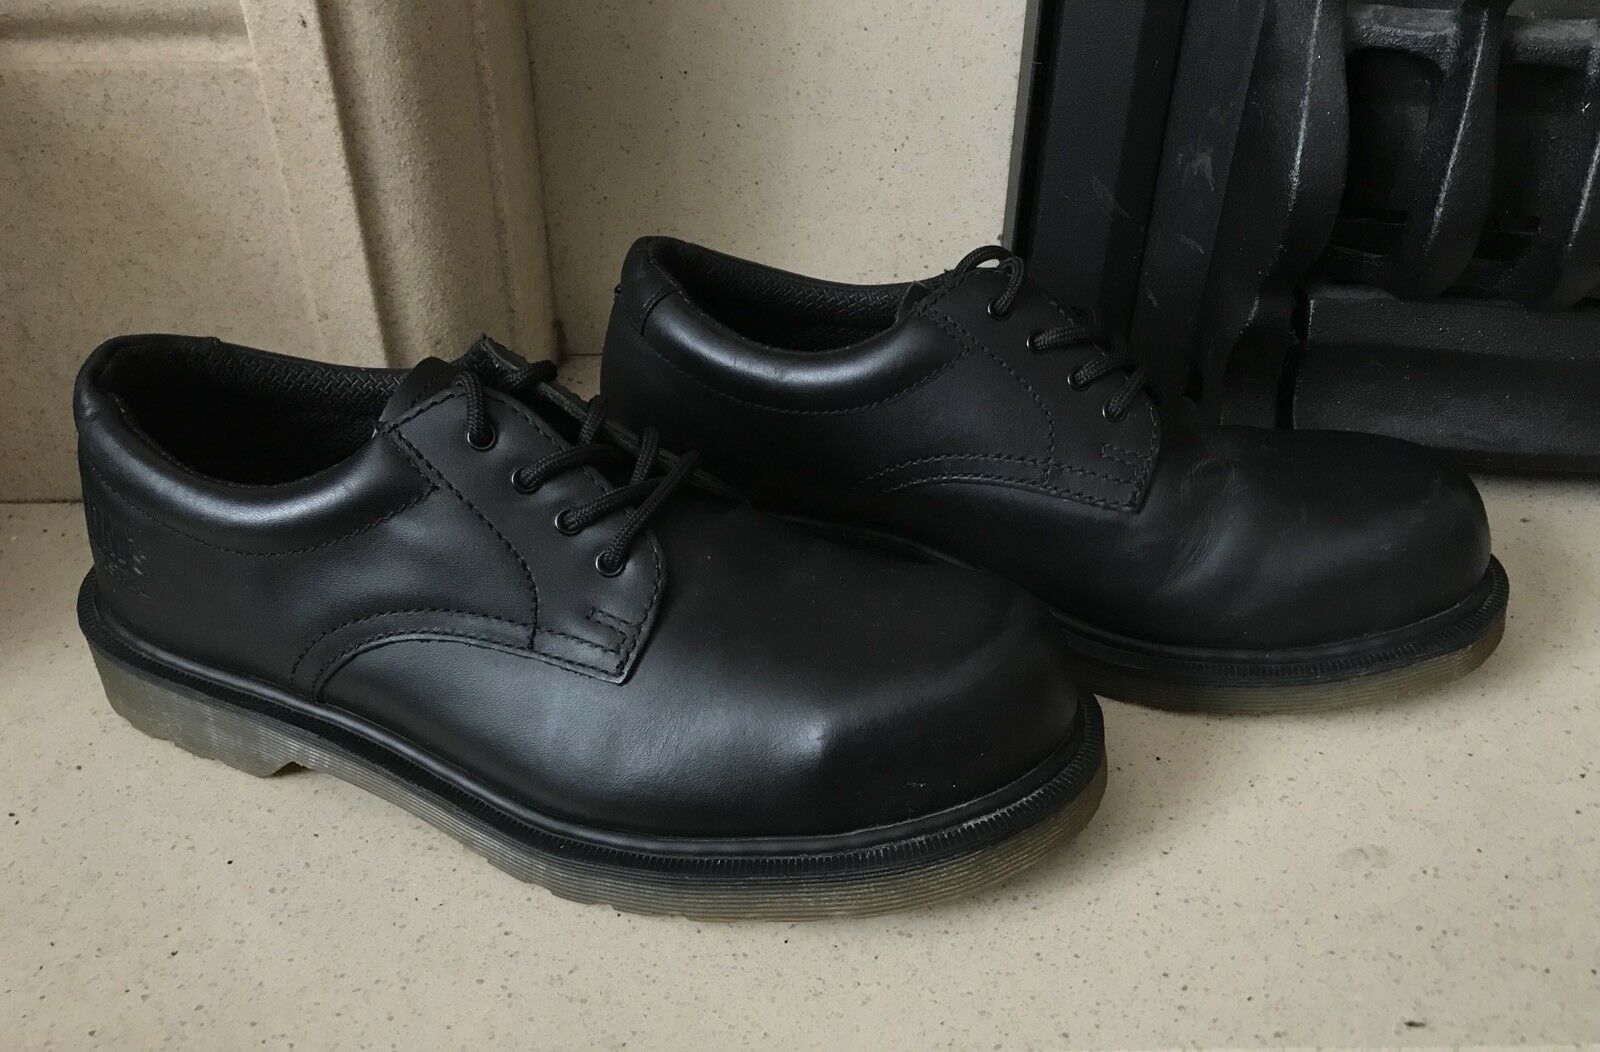 Dr Martens Industrial Men's Steel Toe Cap schuhe Größe 8